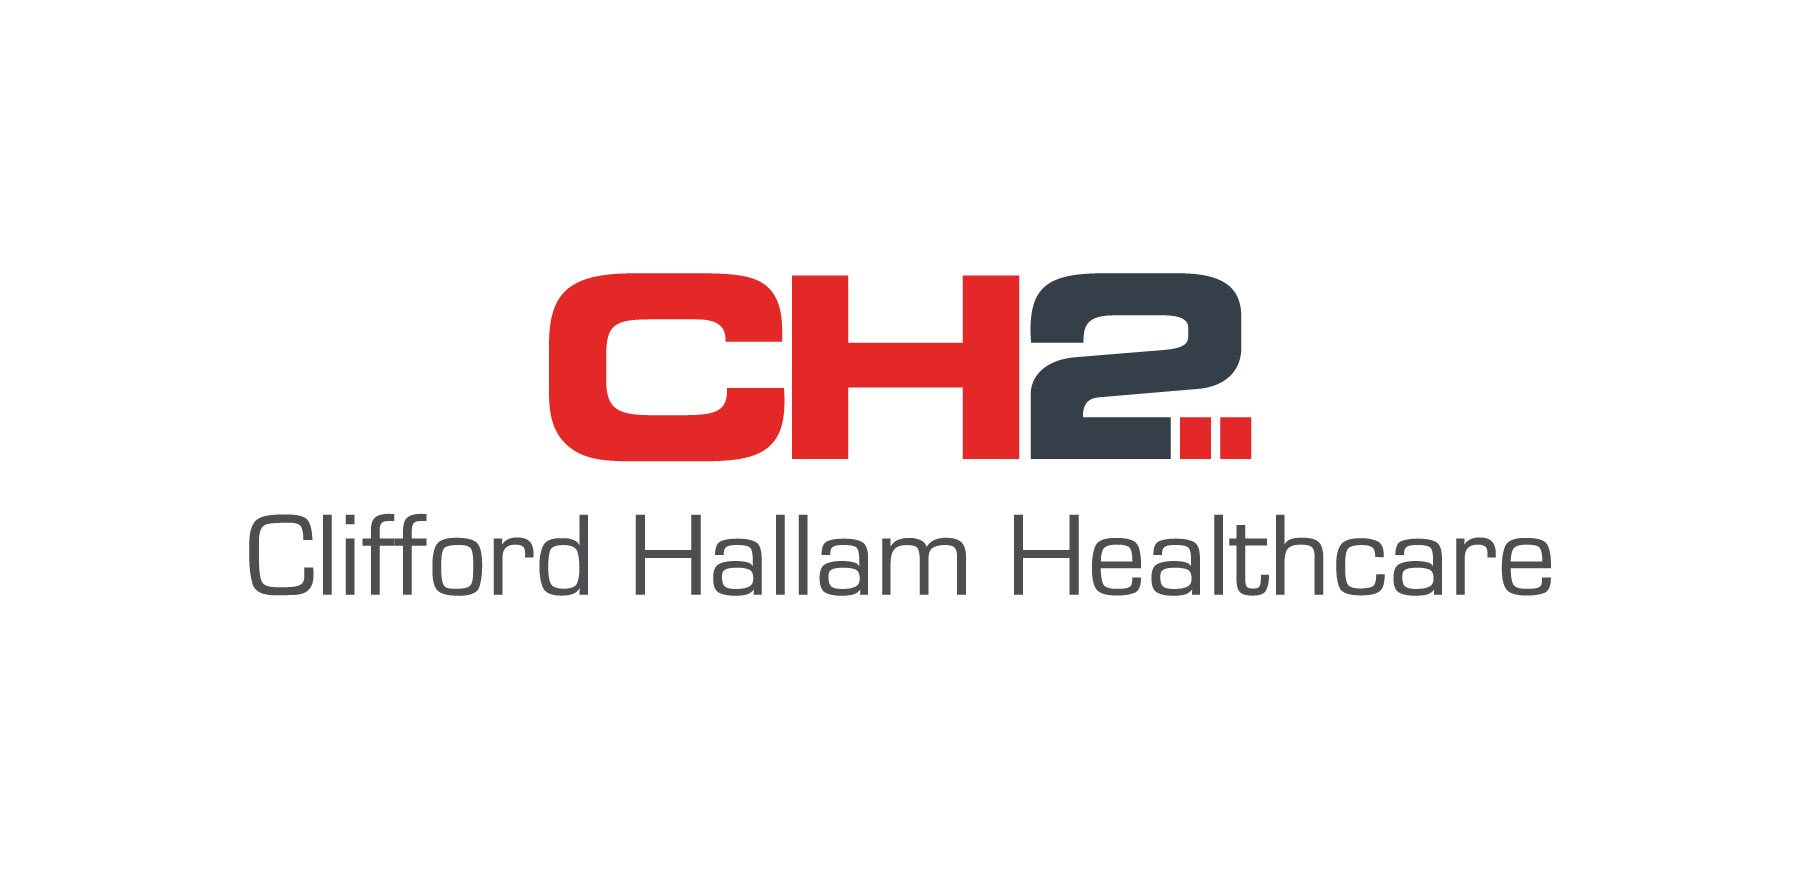 Clifford Hallam Healthcare  - Australian Wholesale Distributor